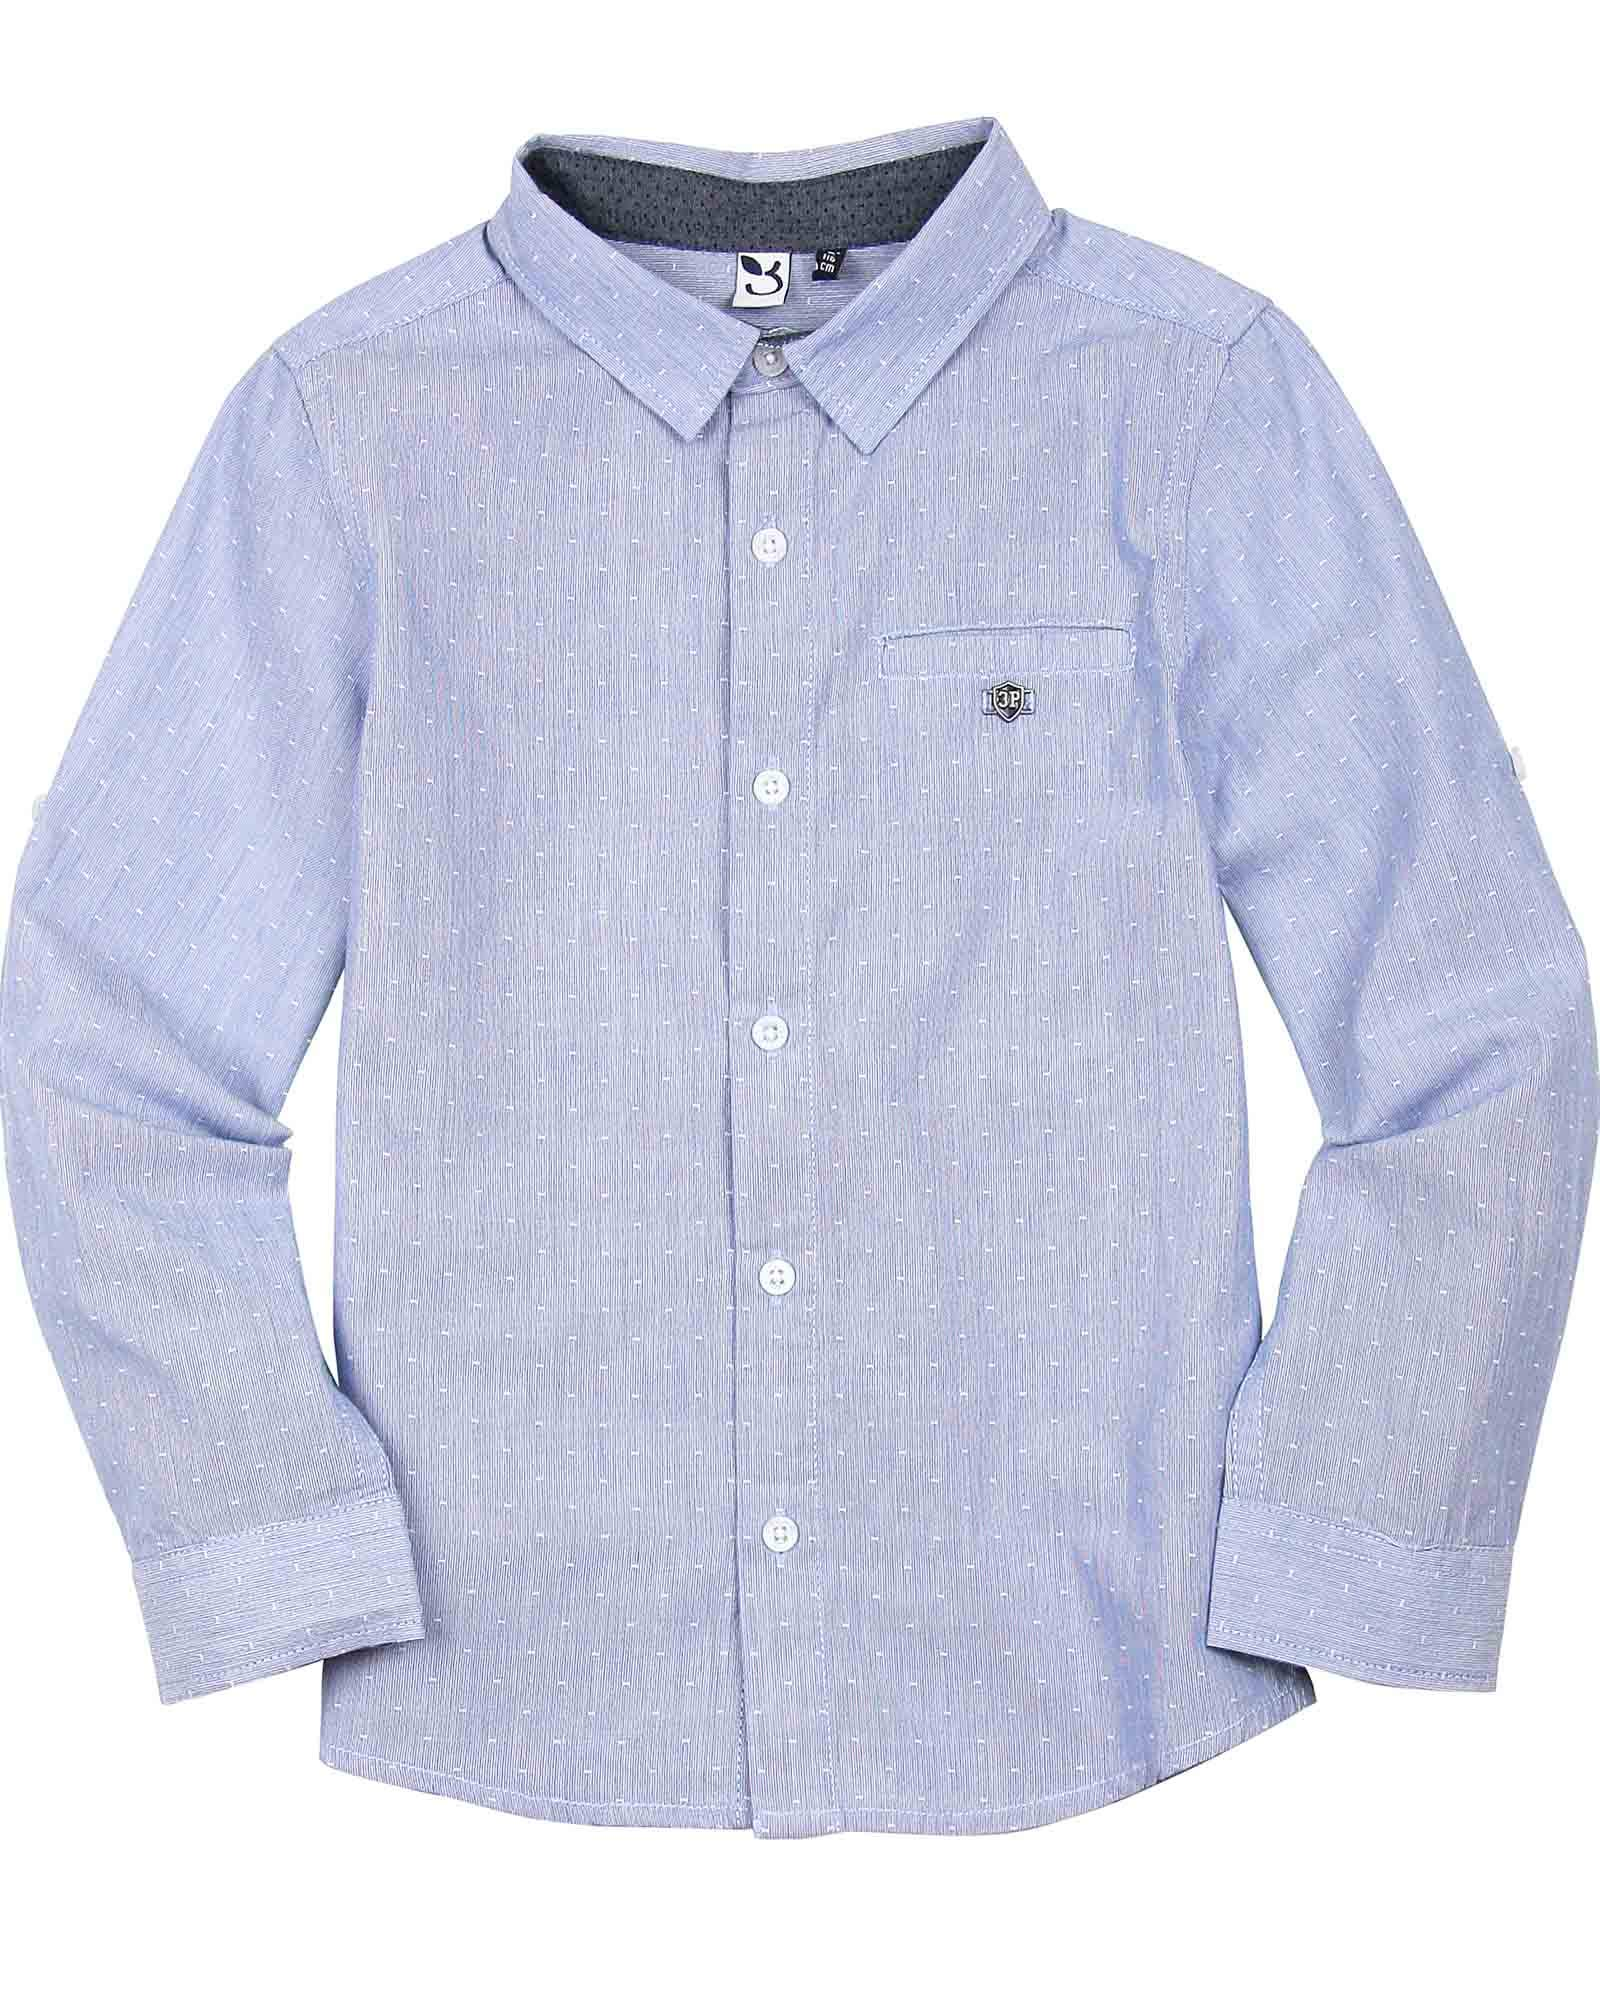 3POMMES Boy's Dress Shirt Label VIP, Sizes 4-12 - 5 Blue